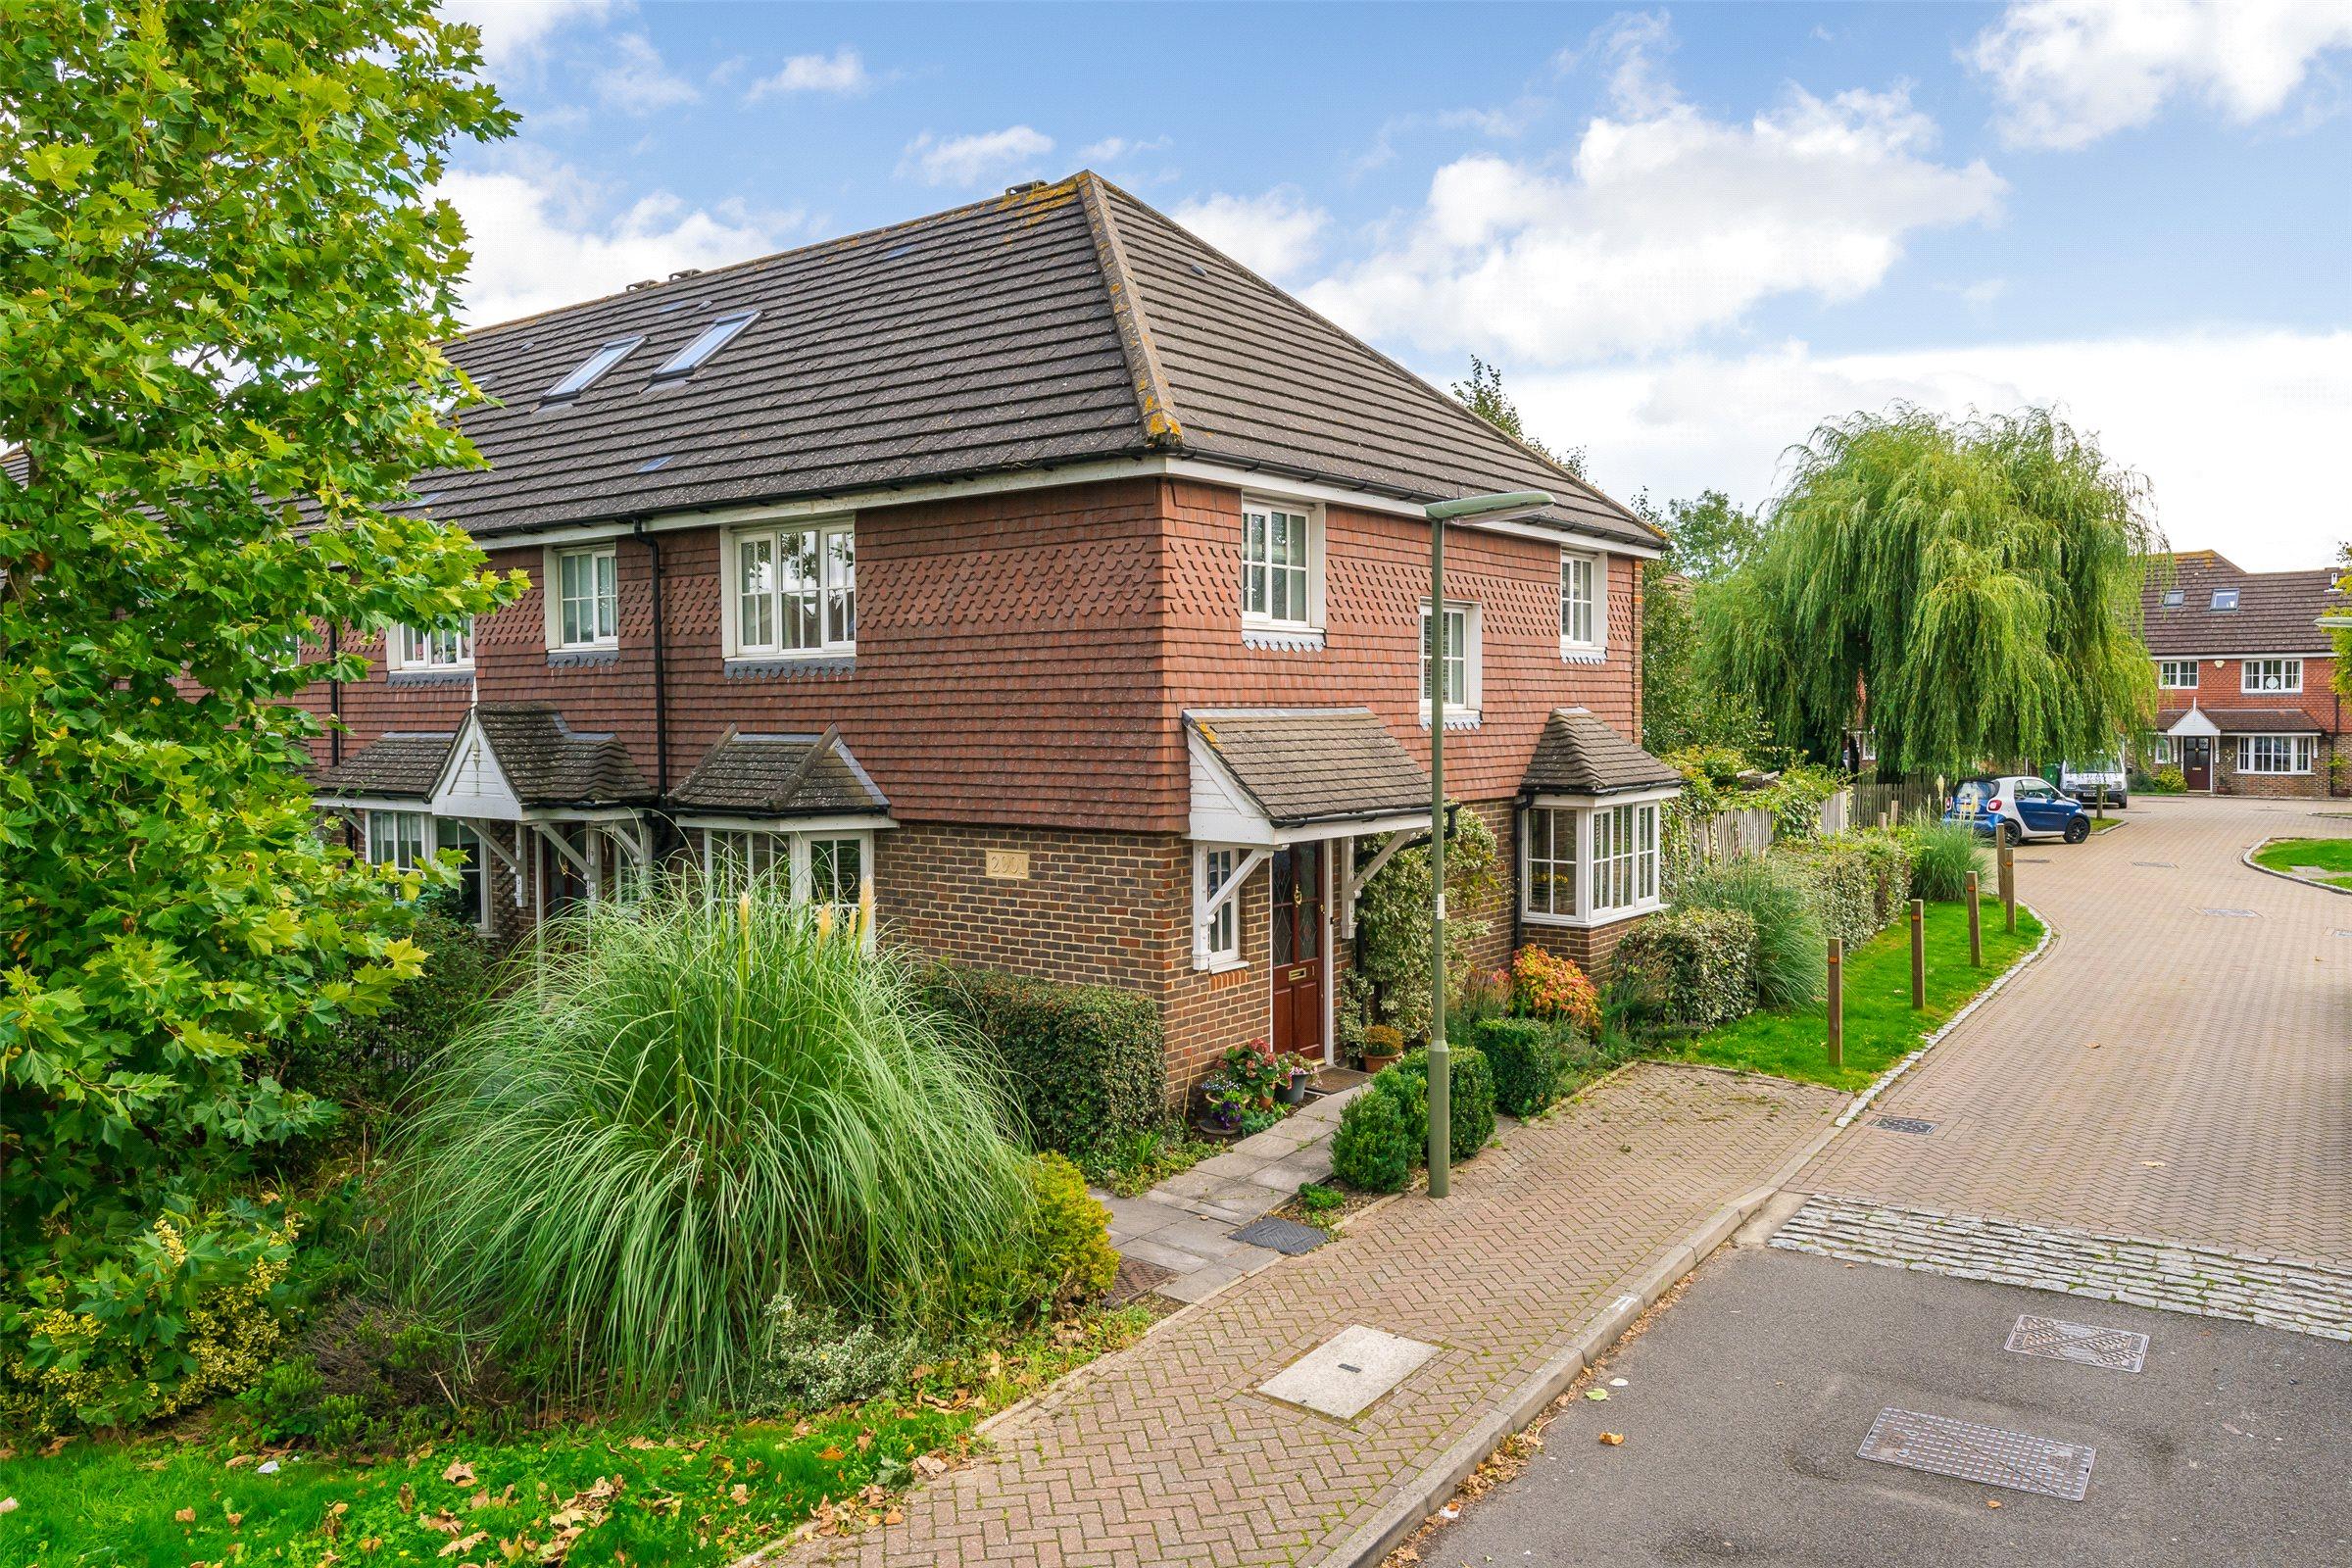 3 Bedrooms Semi Detached House for sale in Priestlands Close, Horley, Surrey, RH6